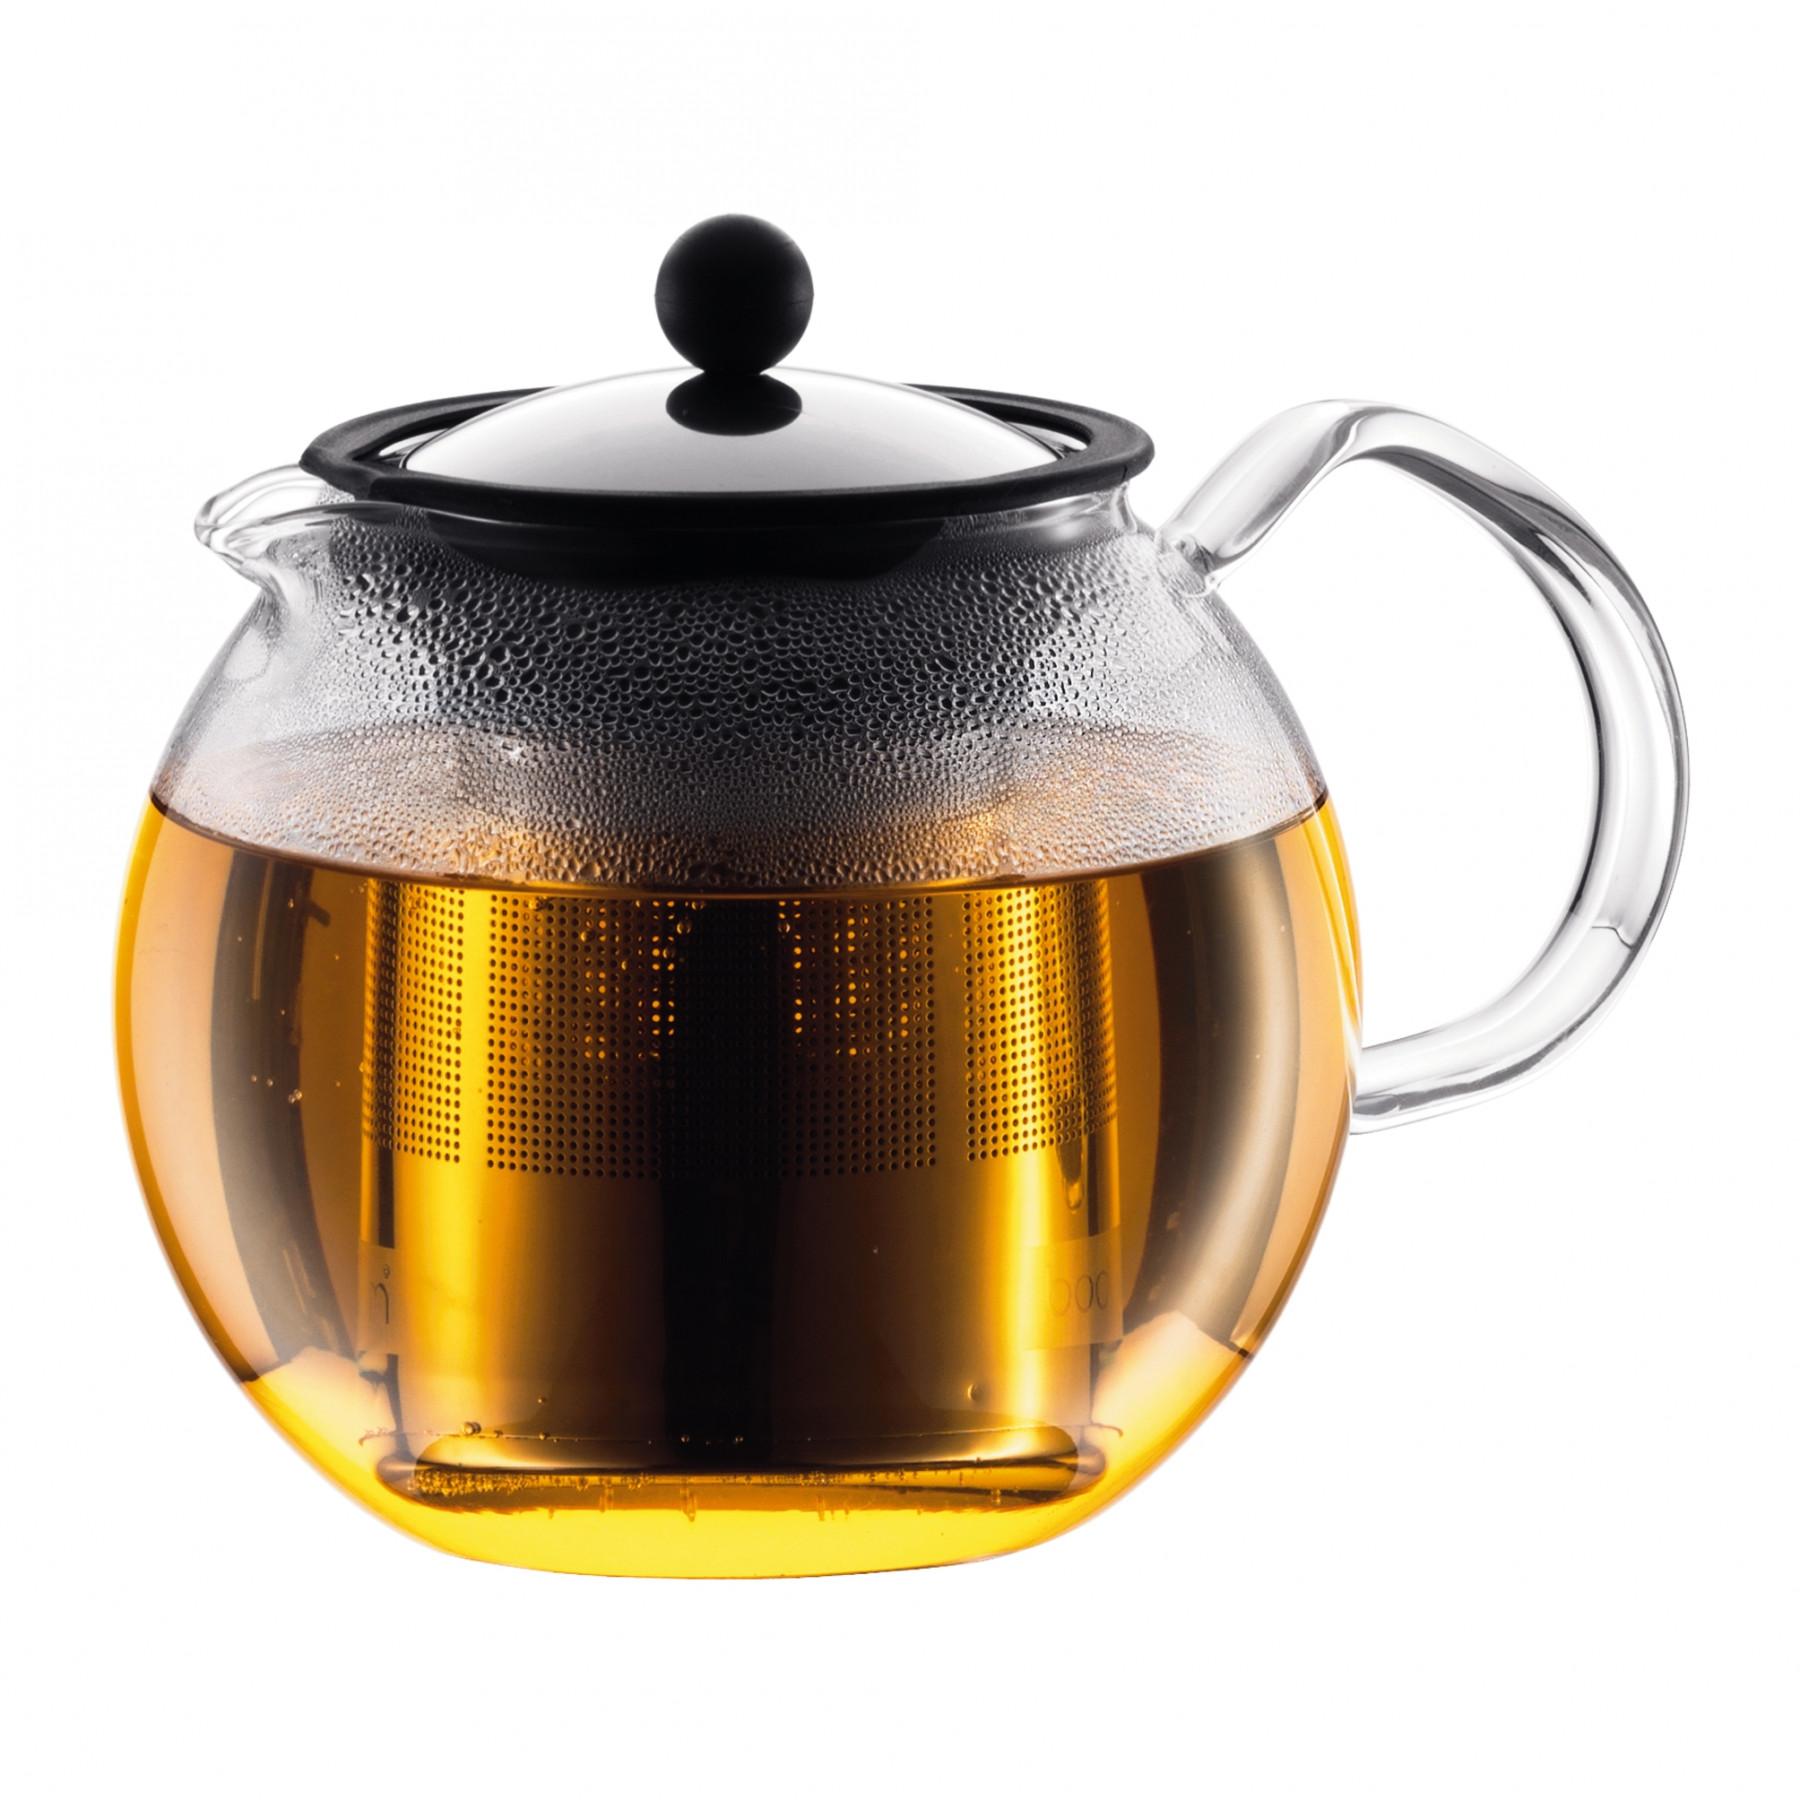 Bodum Assam Line 3 Tea Maker 17 oz.